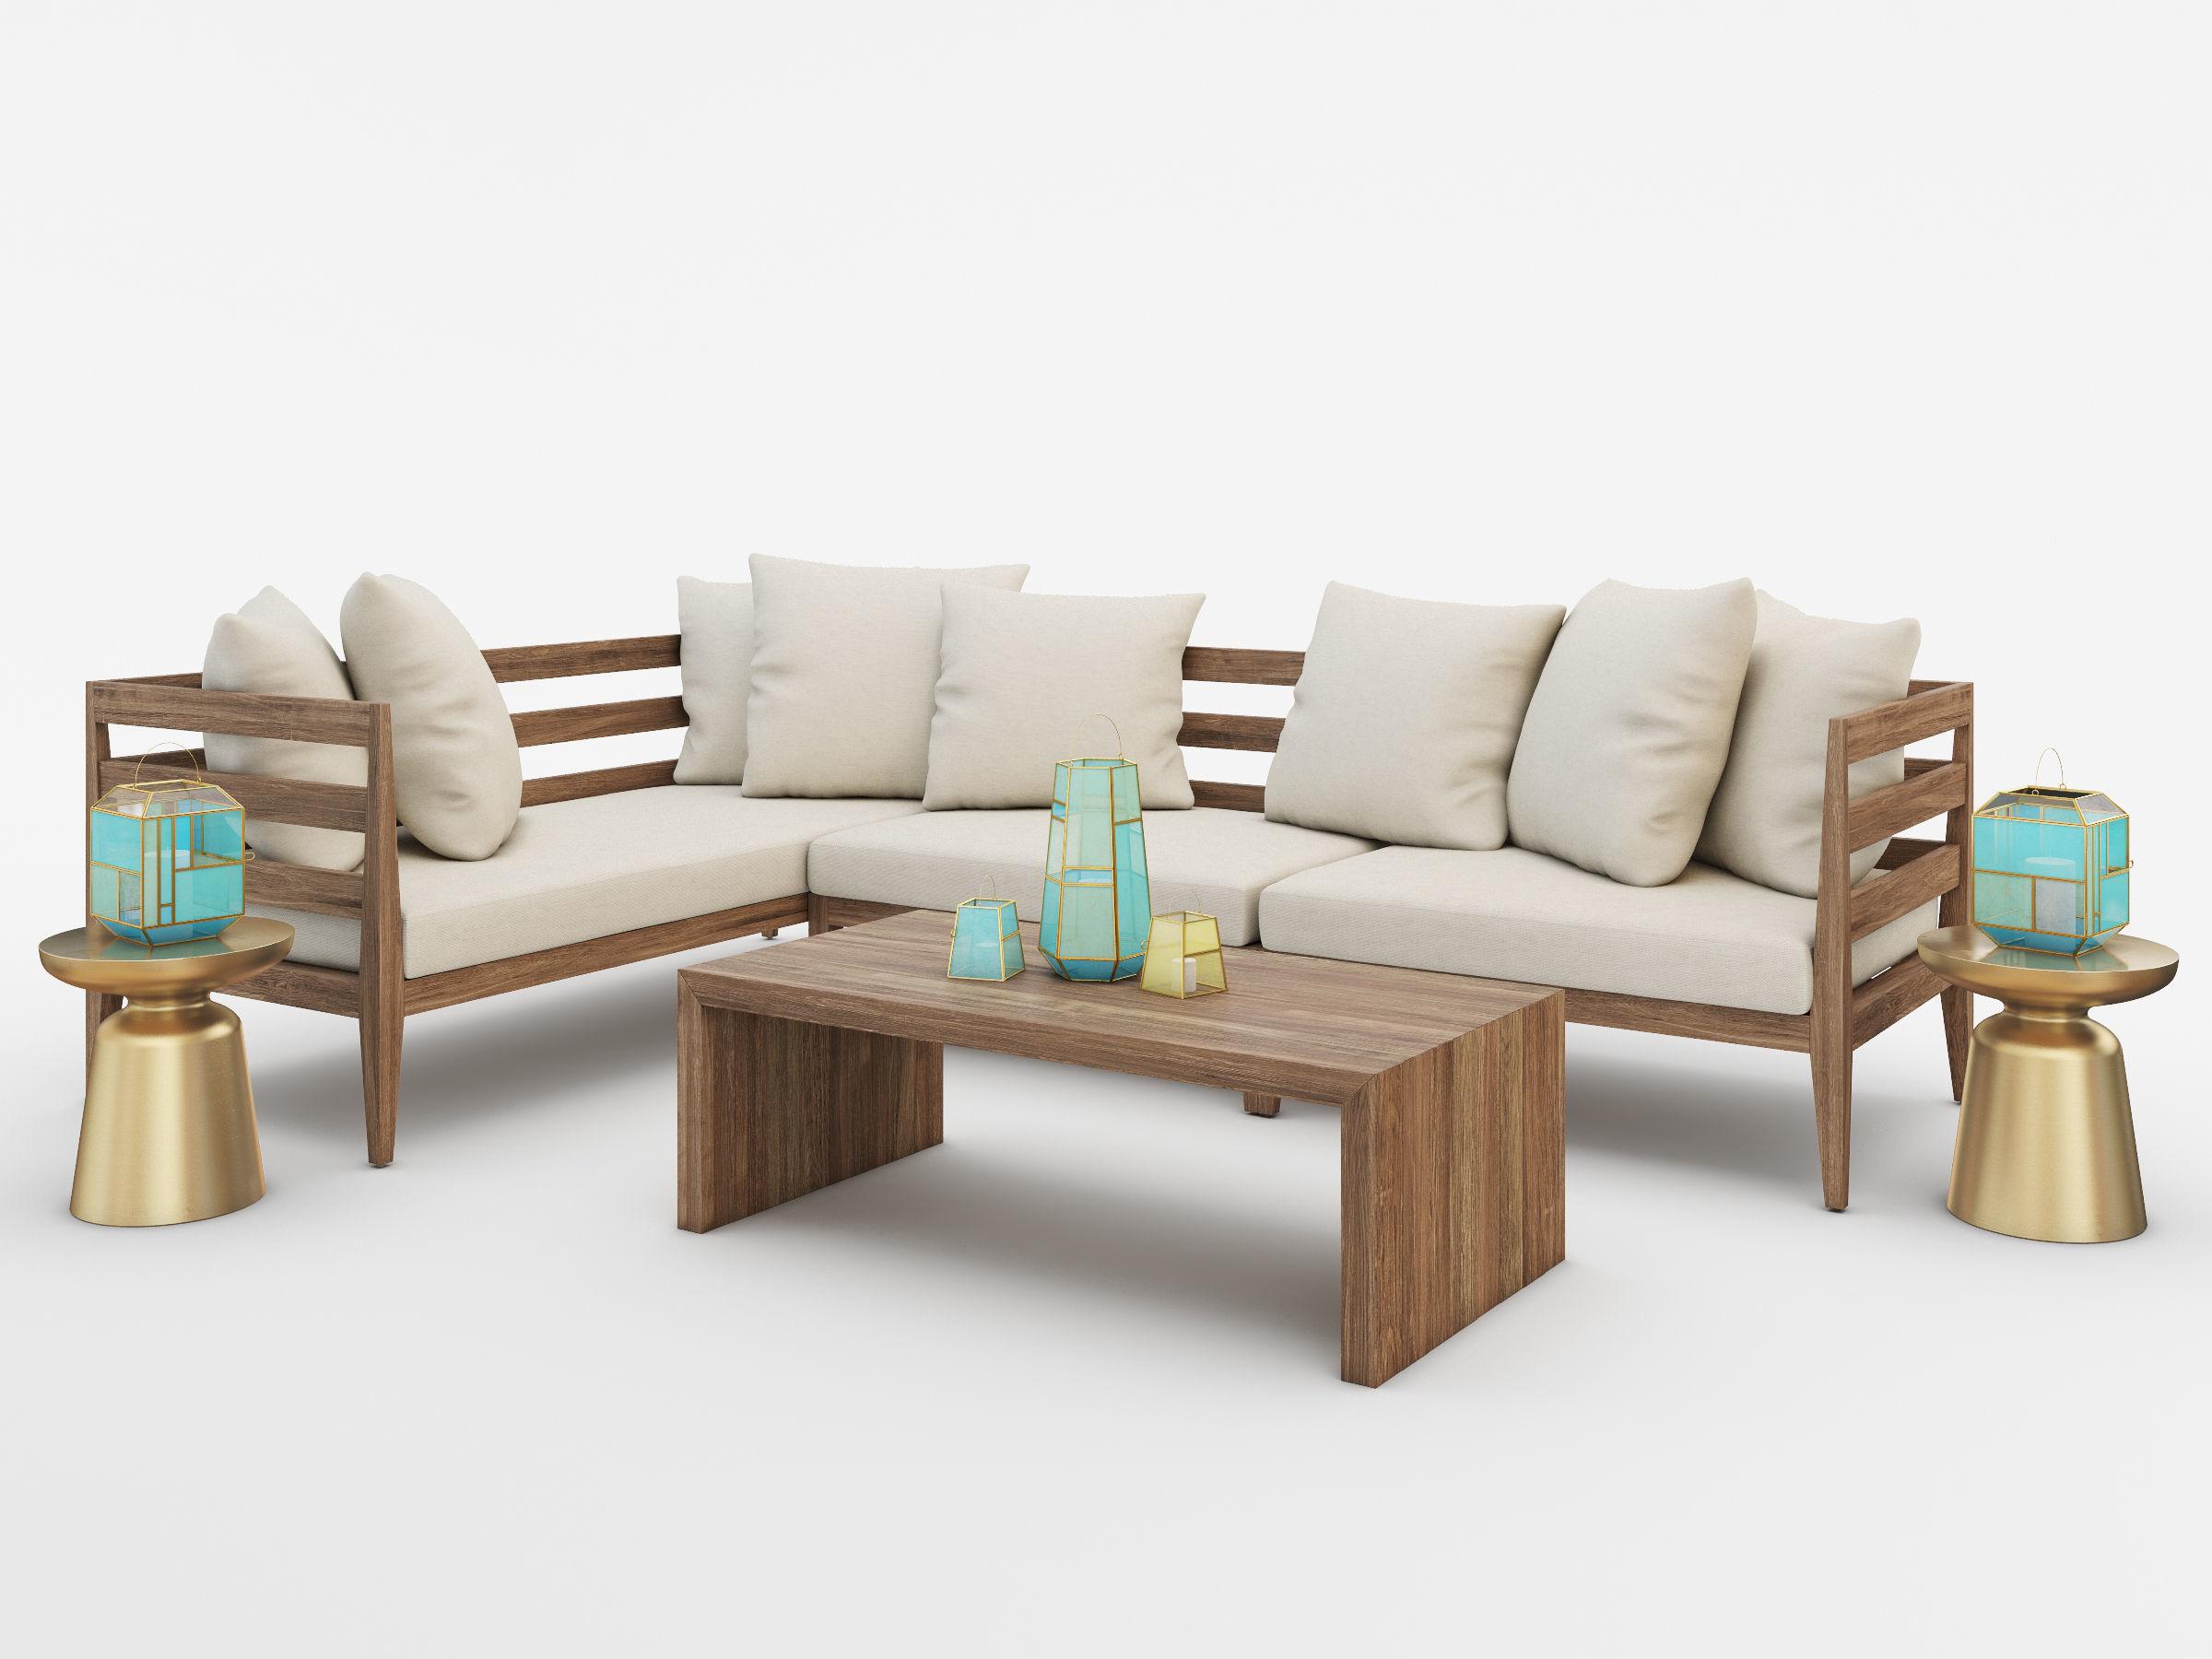 Yfone Wood | Chaise Jardin Gifi Genial 33 Meilleur De Graphie De